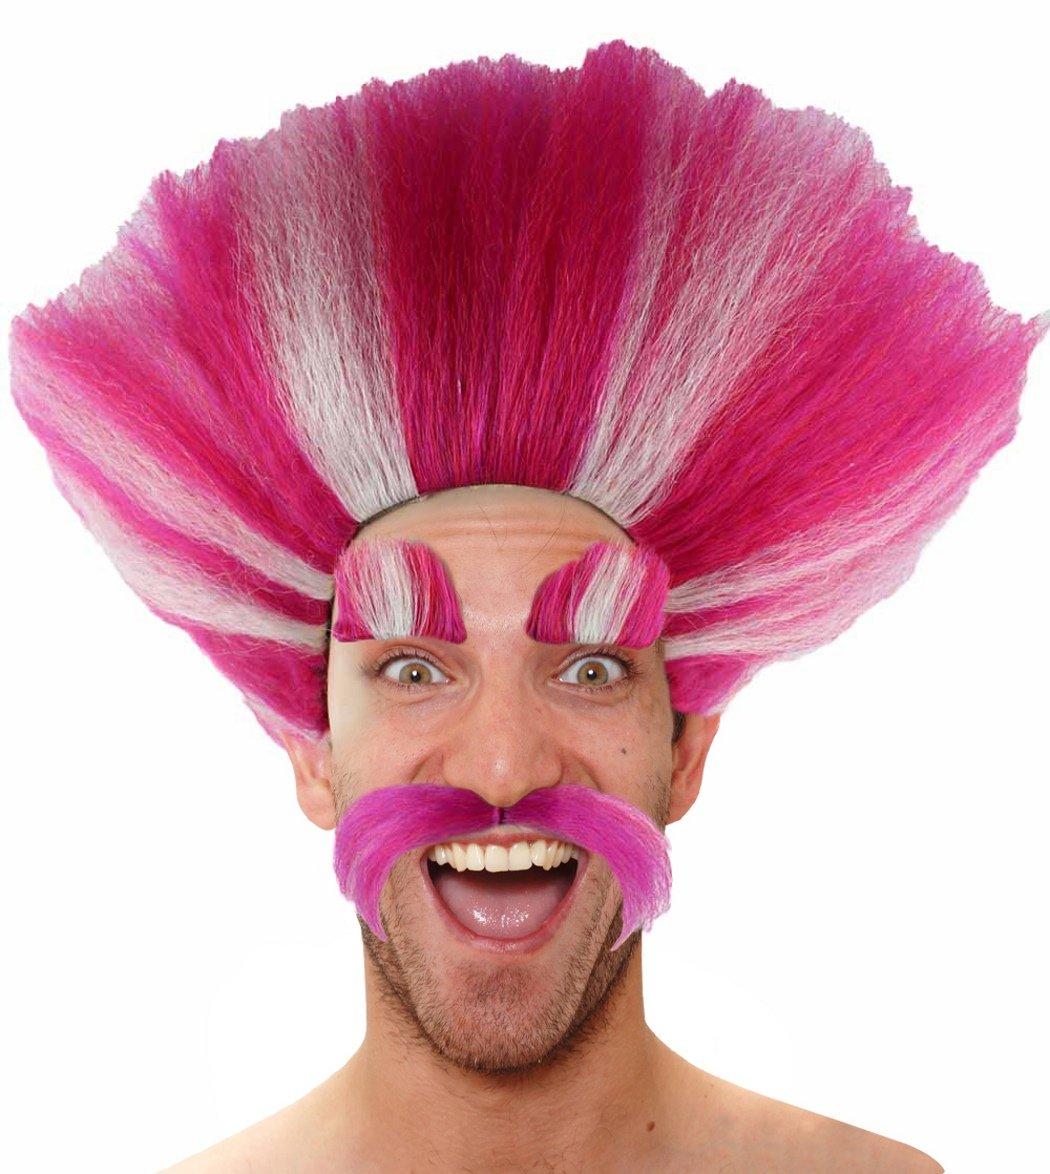 Pink Crazy Wig w/Wig Cap Cosplay Costume Party Halloween Hairpiece for Men Women